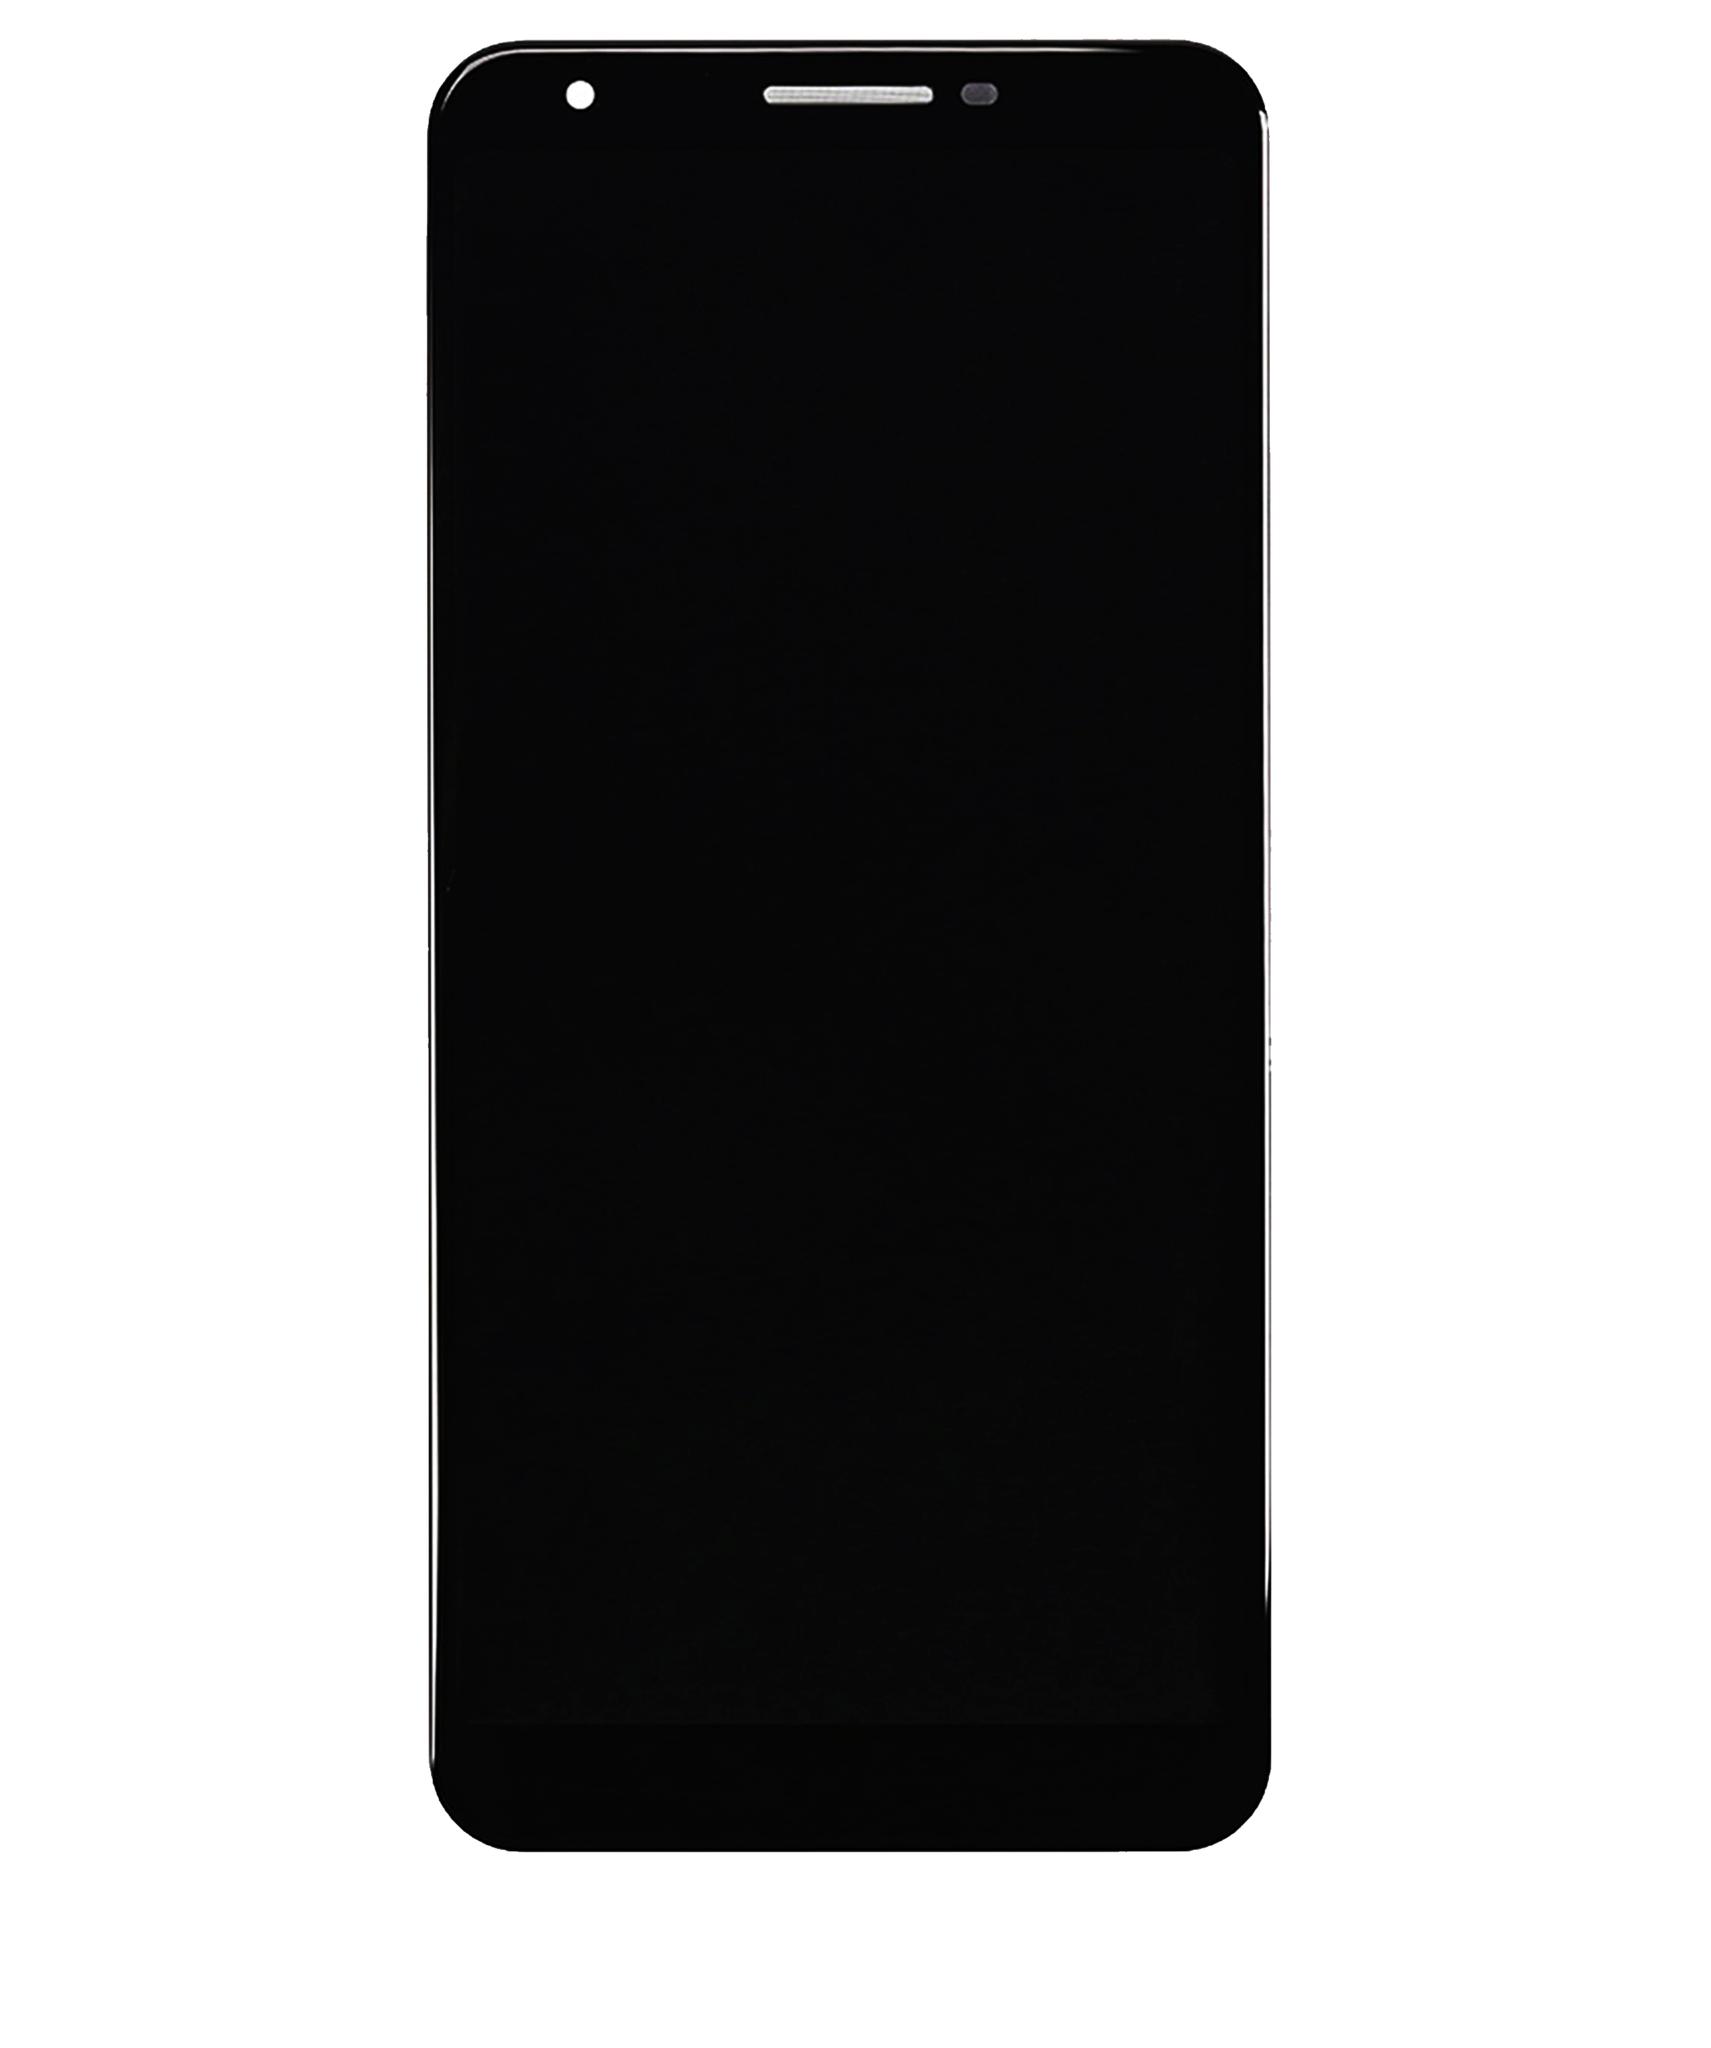 Google Pixel 3a XL G020C Display Module Black (NO ADHESIVE)